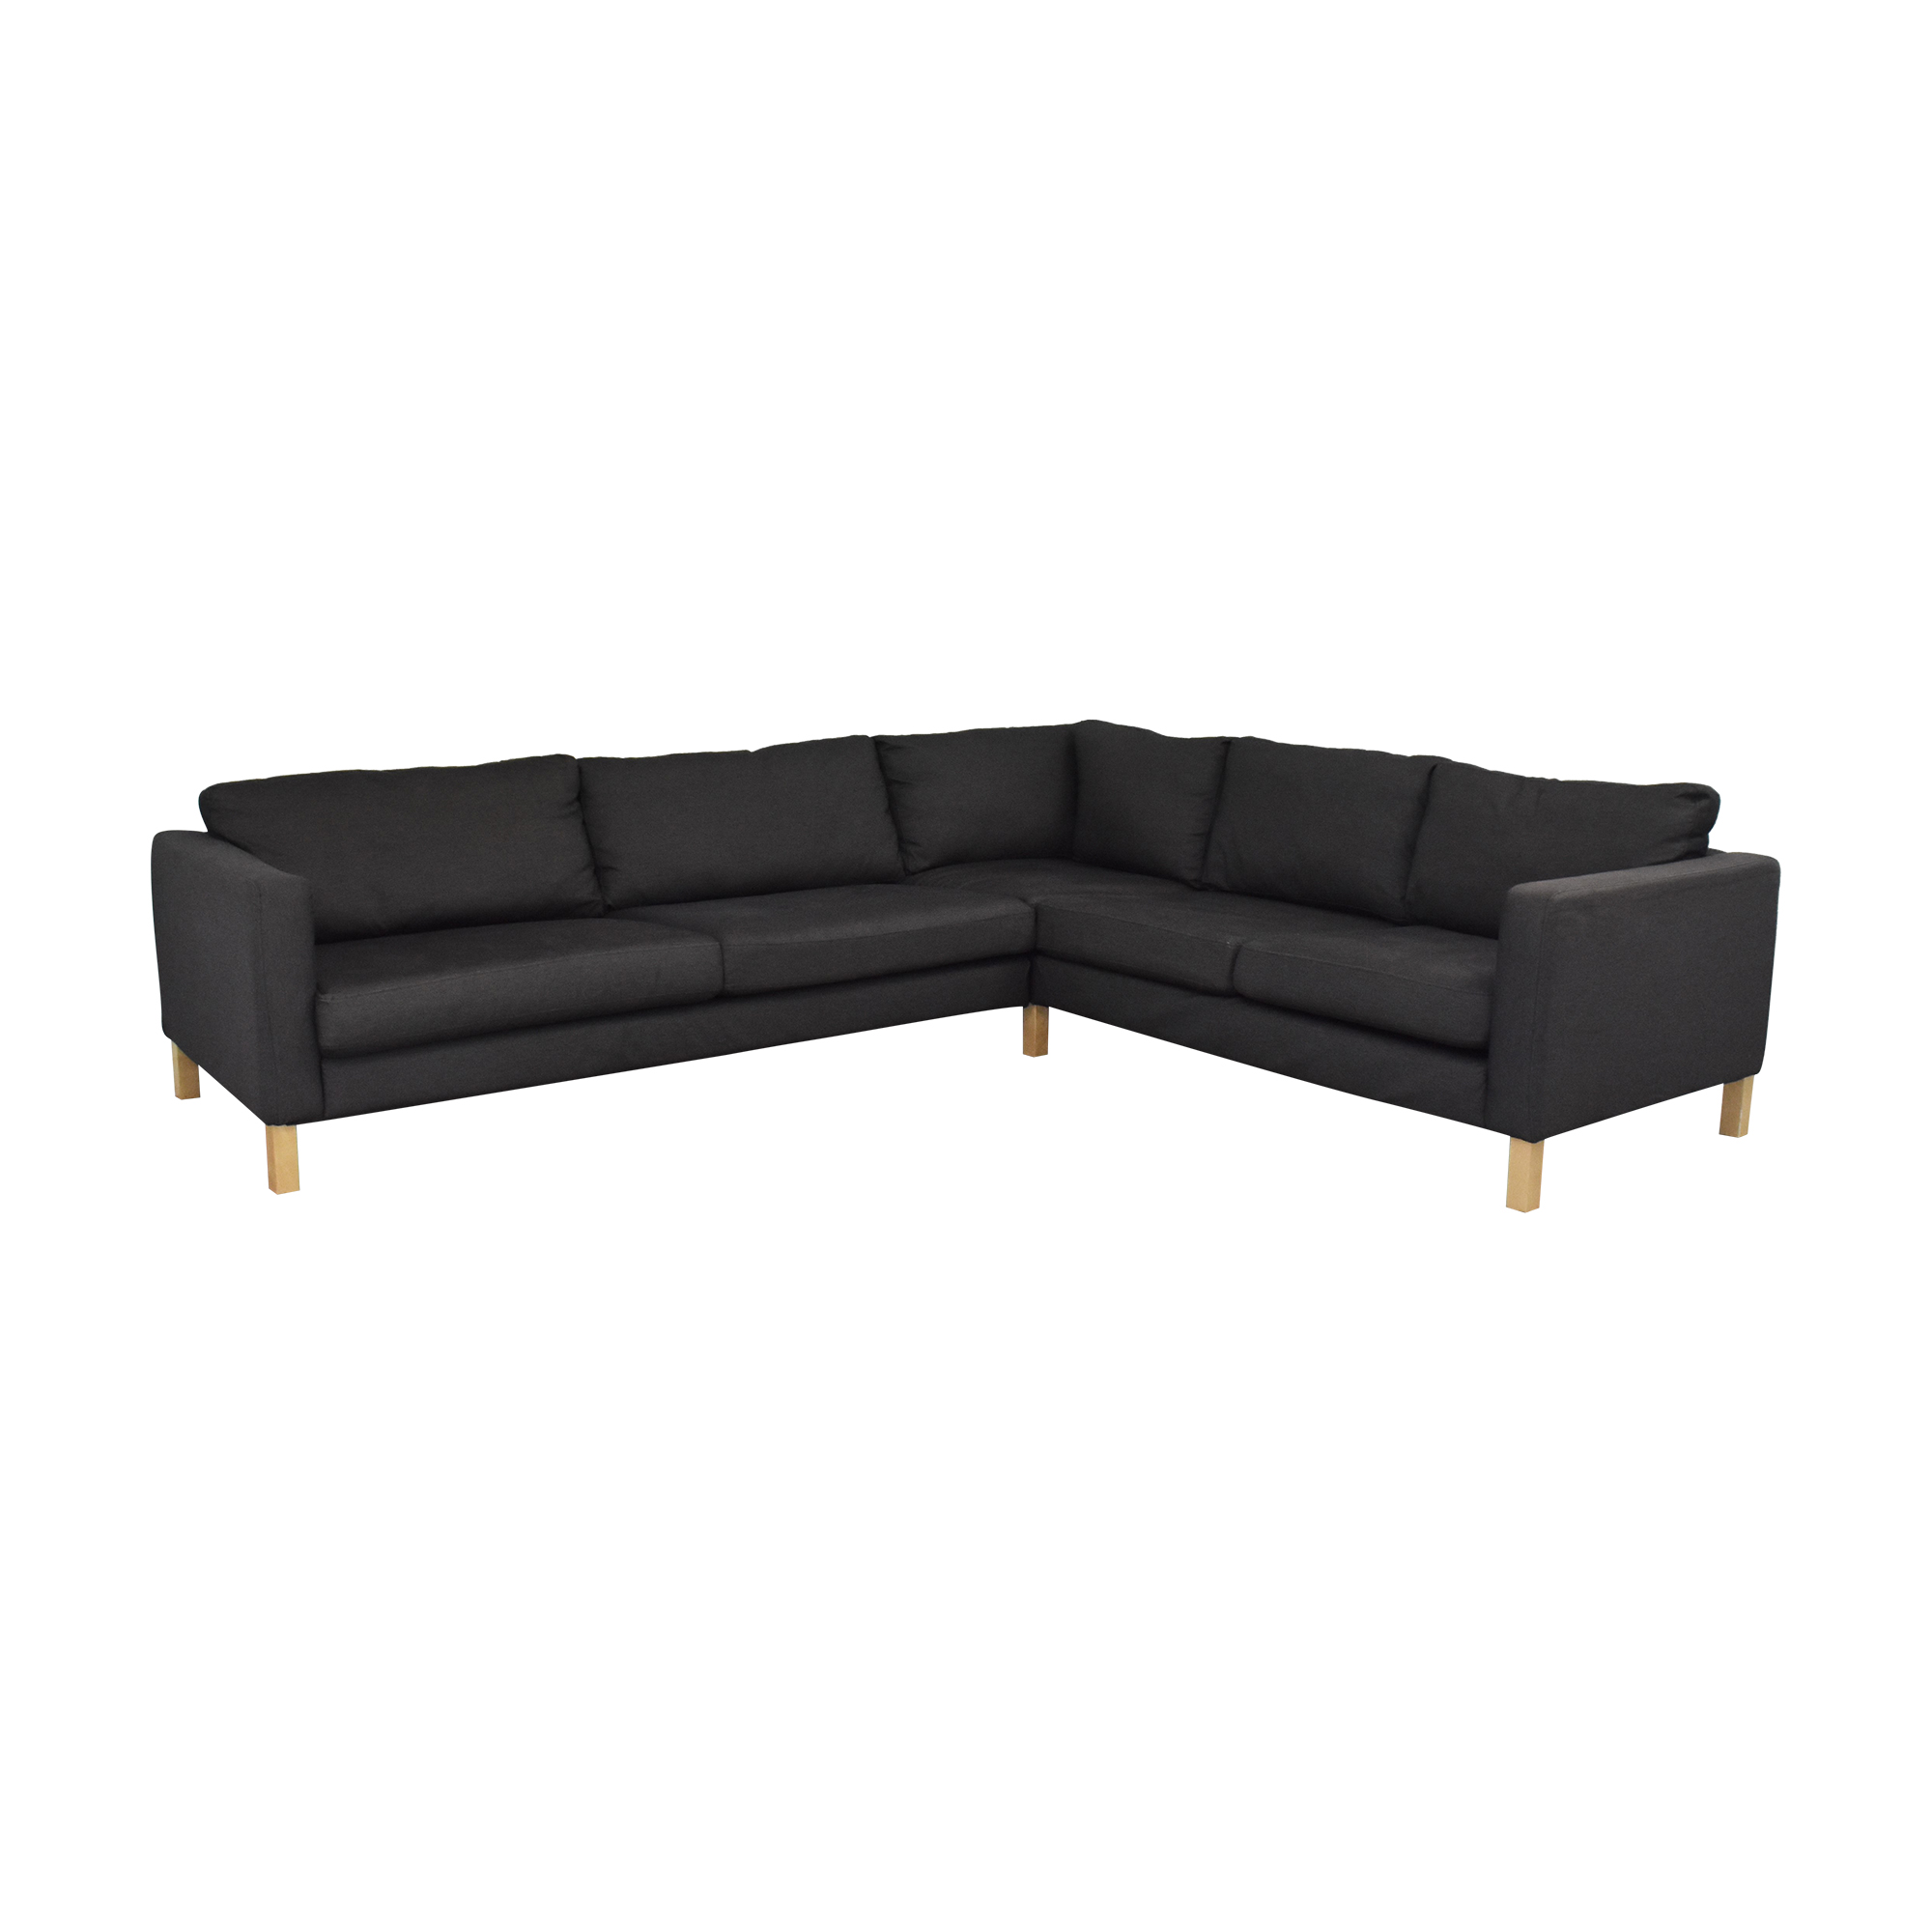 IKEA IKEA Kivik Corner Sectional Sofa ct